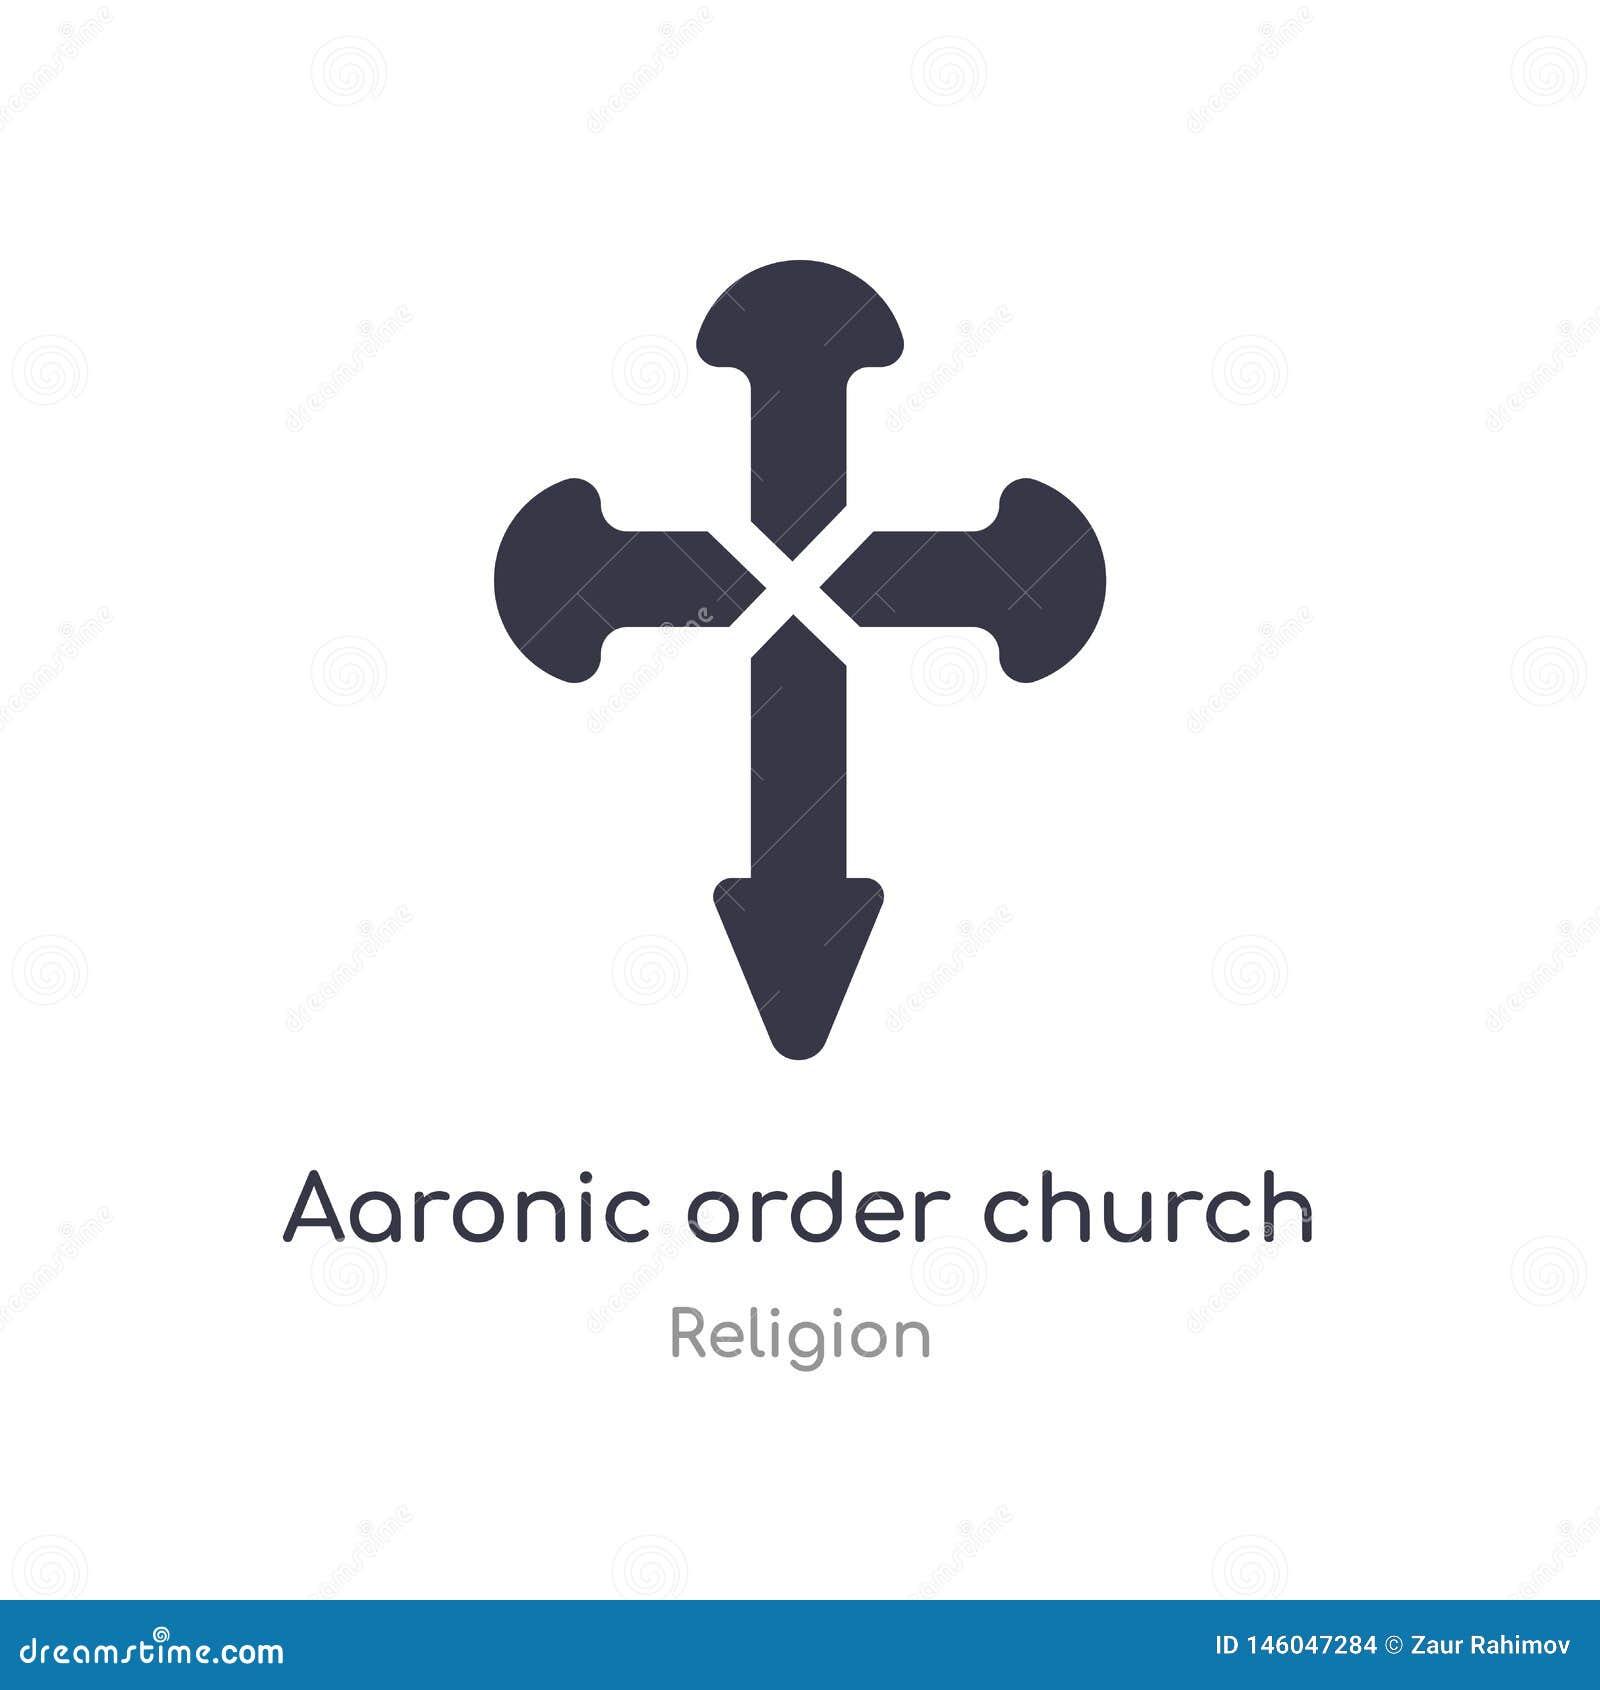 Het aaronic pictogram van de ordekerk geïsoleerde aaronic het pictogram vectorillustratie van de ordekerk van godsdienstinzamelin